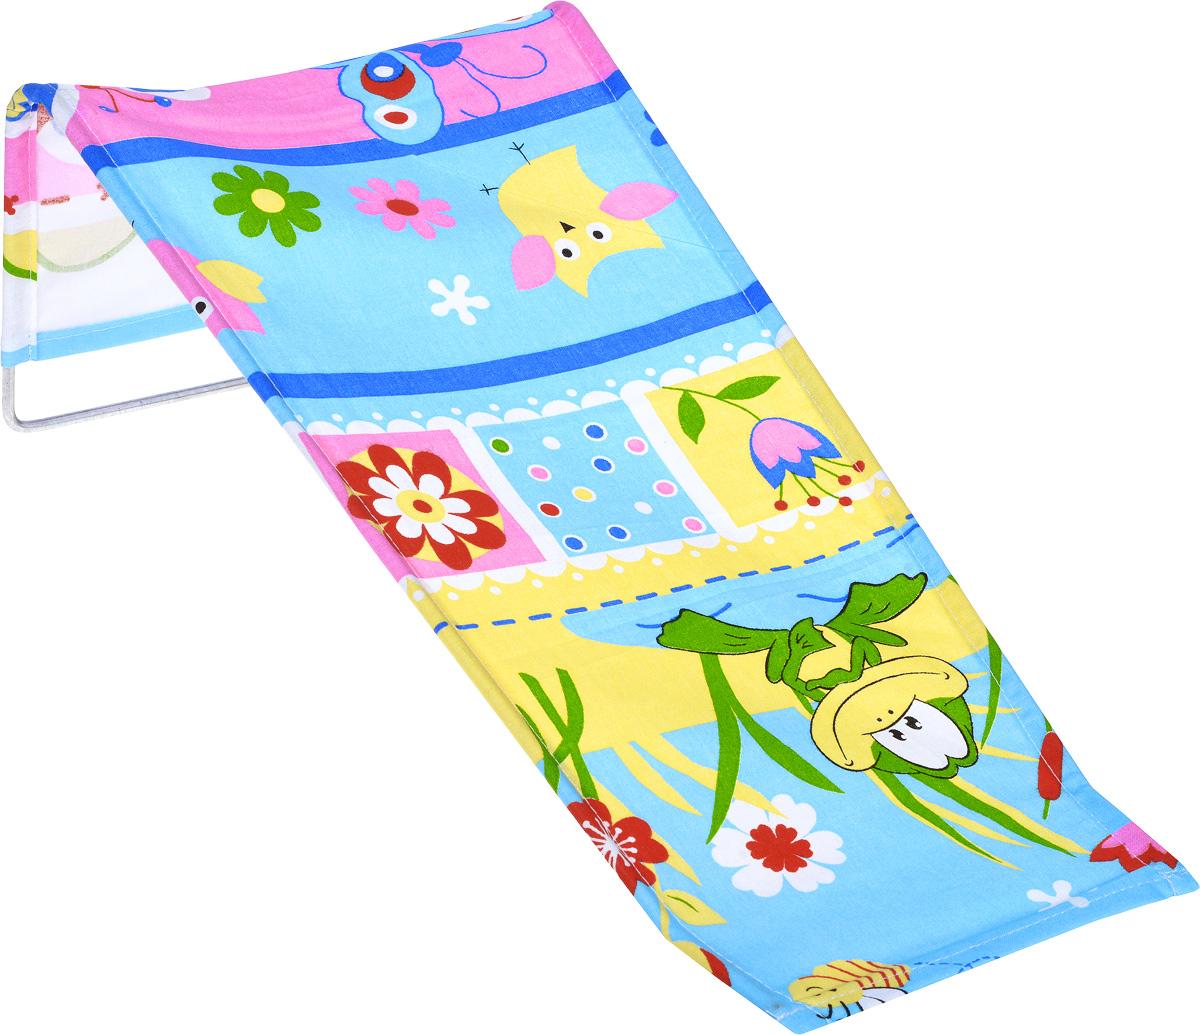 Фея Подставка для купания Лягушка цвет голубой